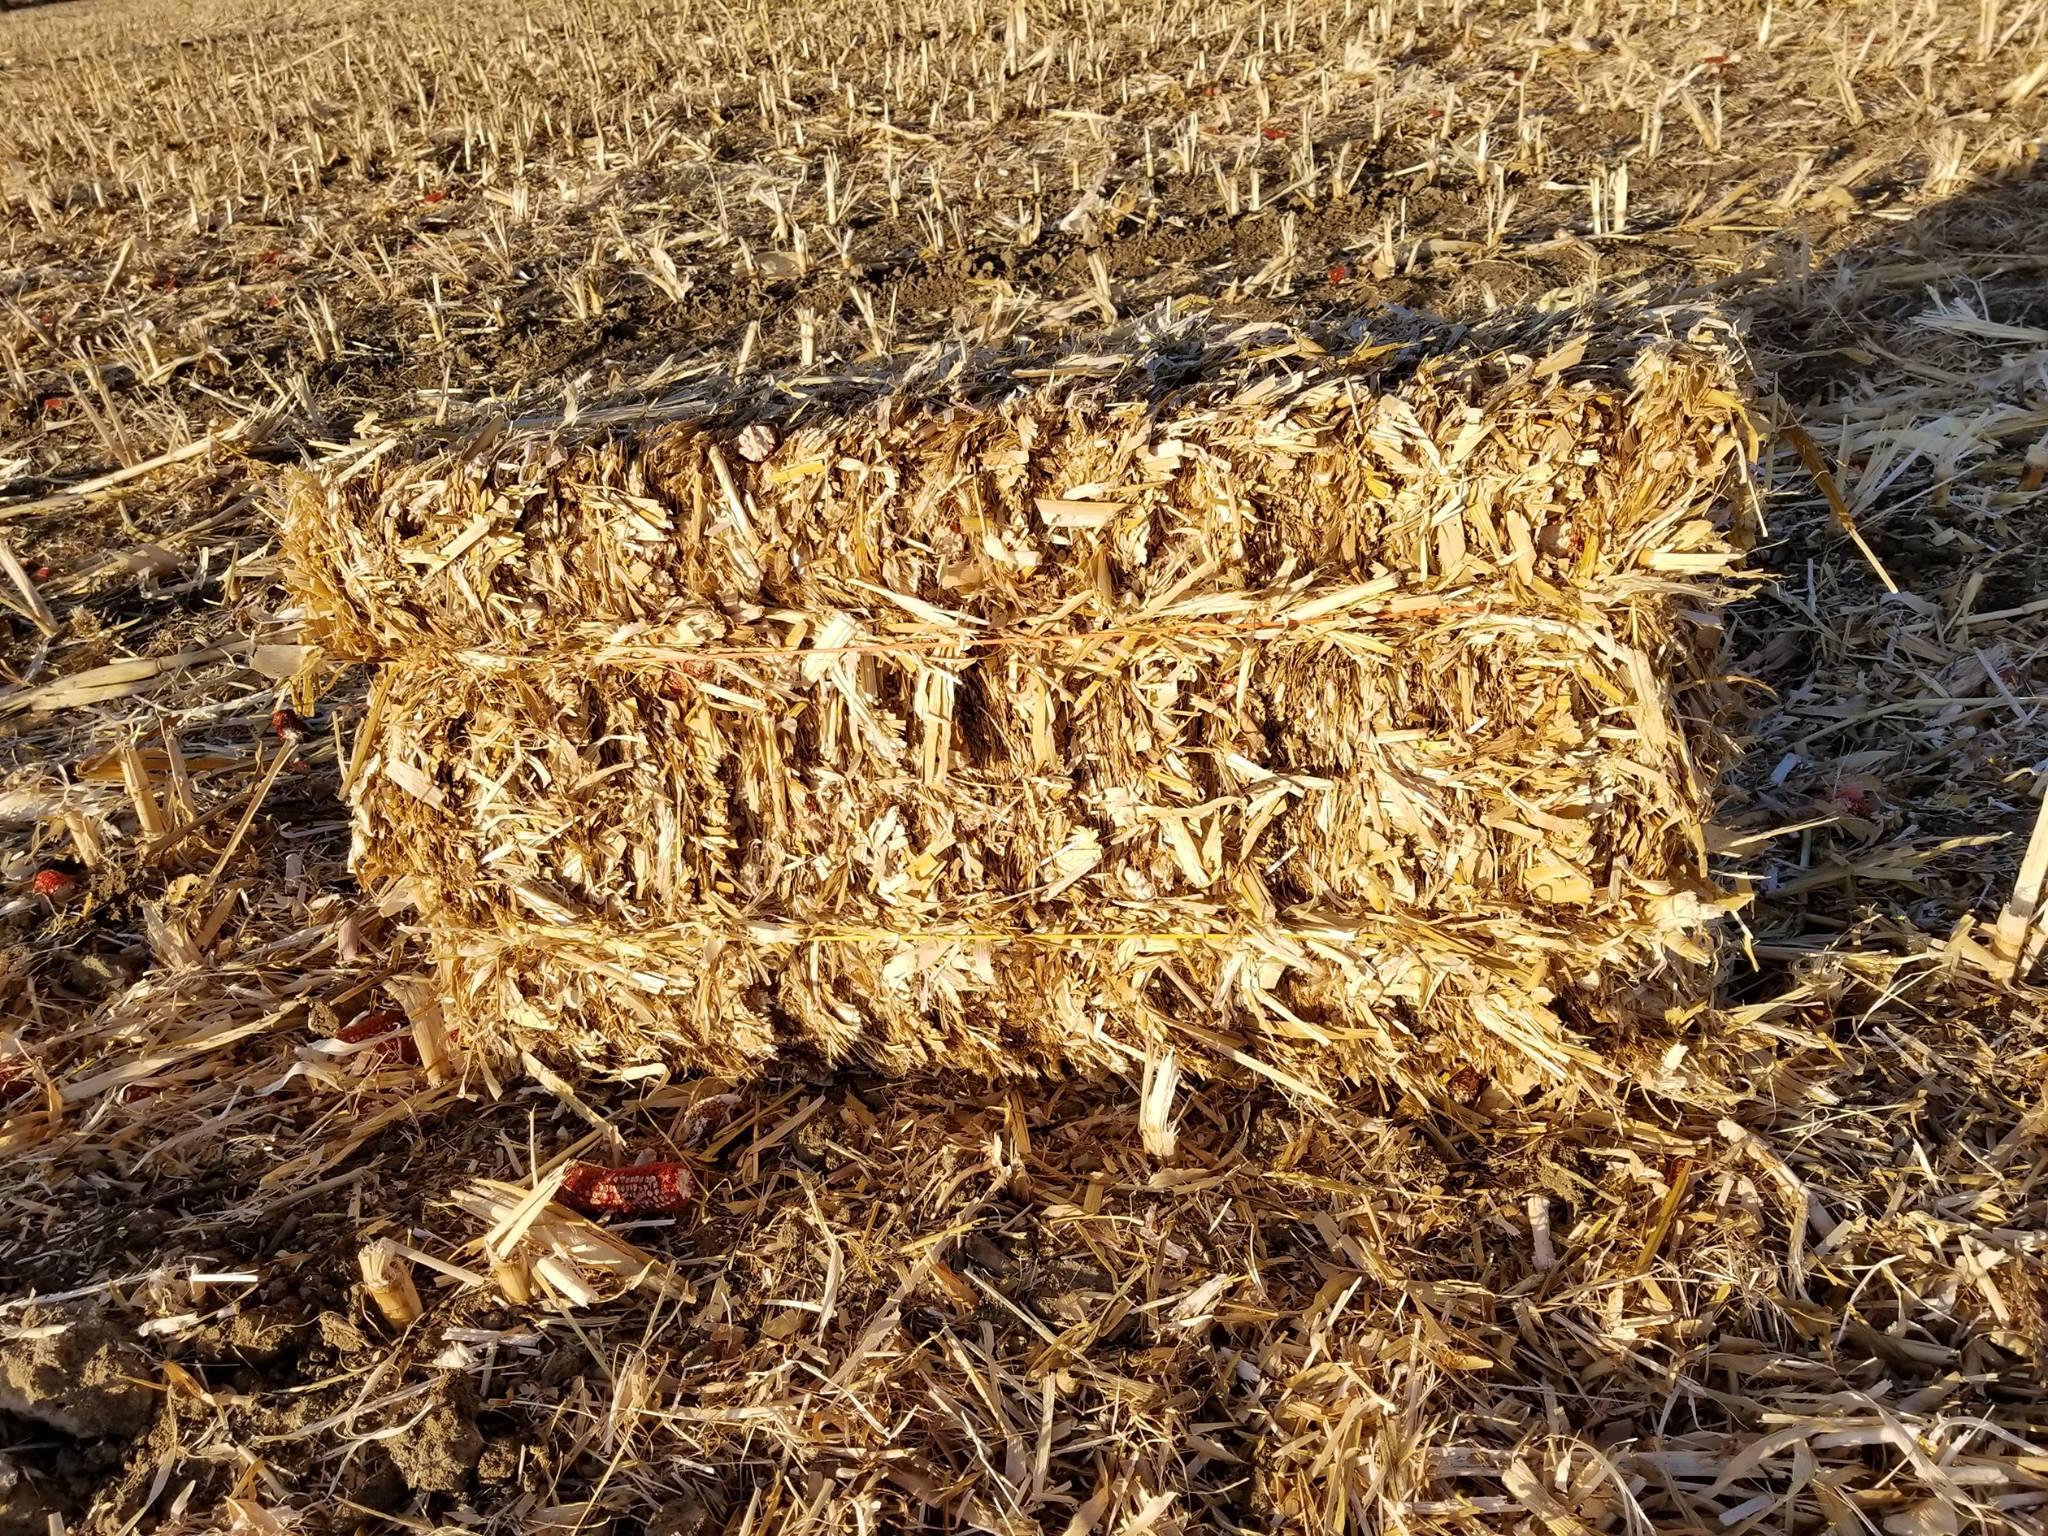 Corn stalk bales